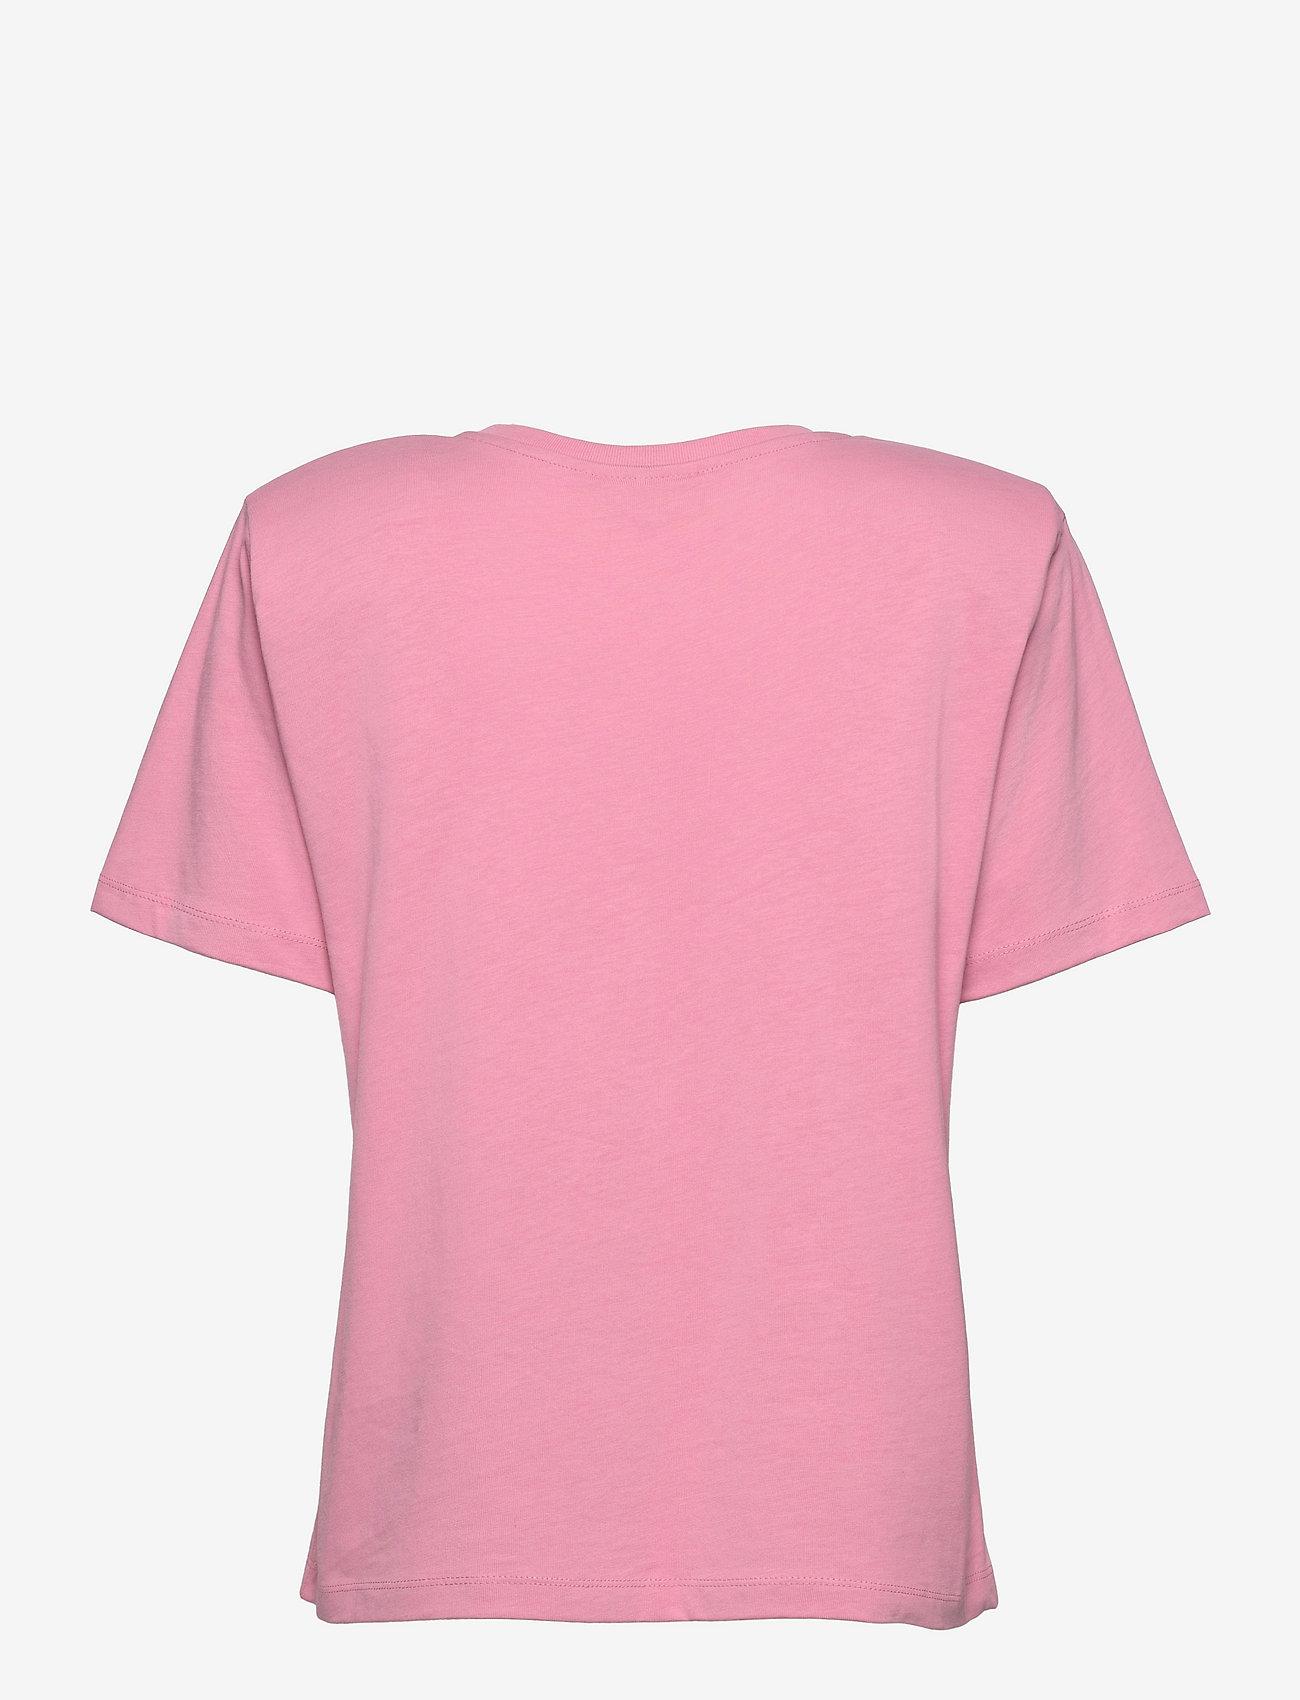 Gestuz - JoryGZ tee - t-shirts - cashmere rose - 1